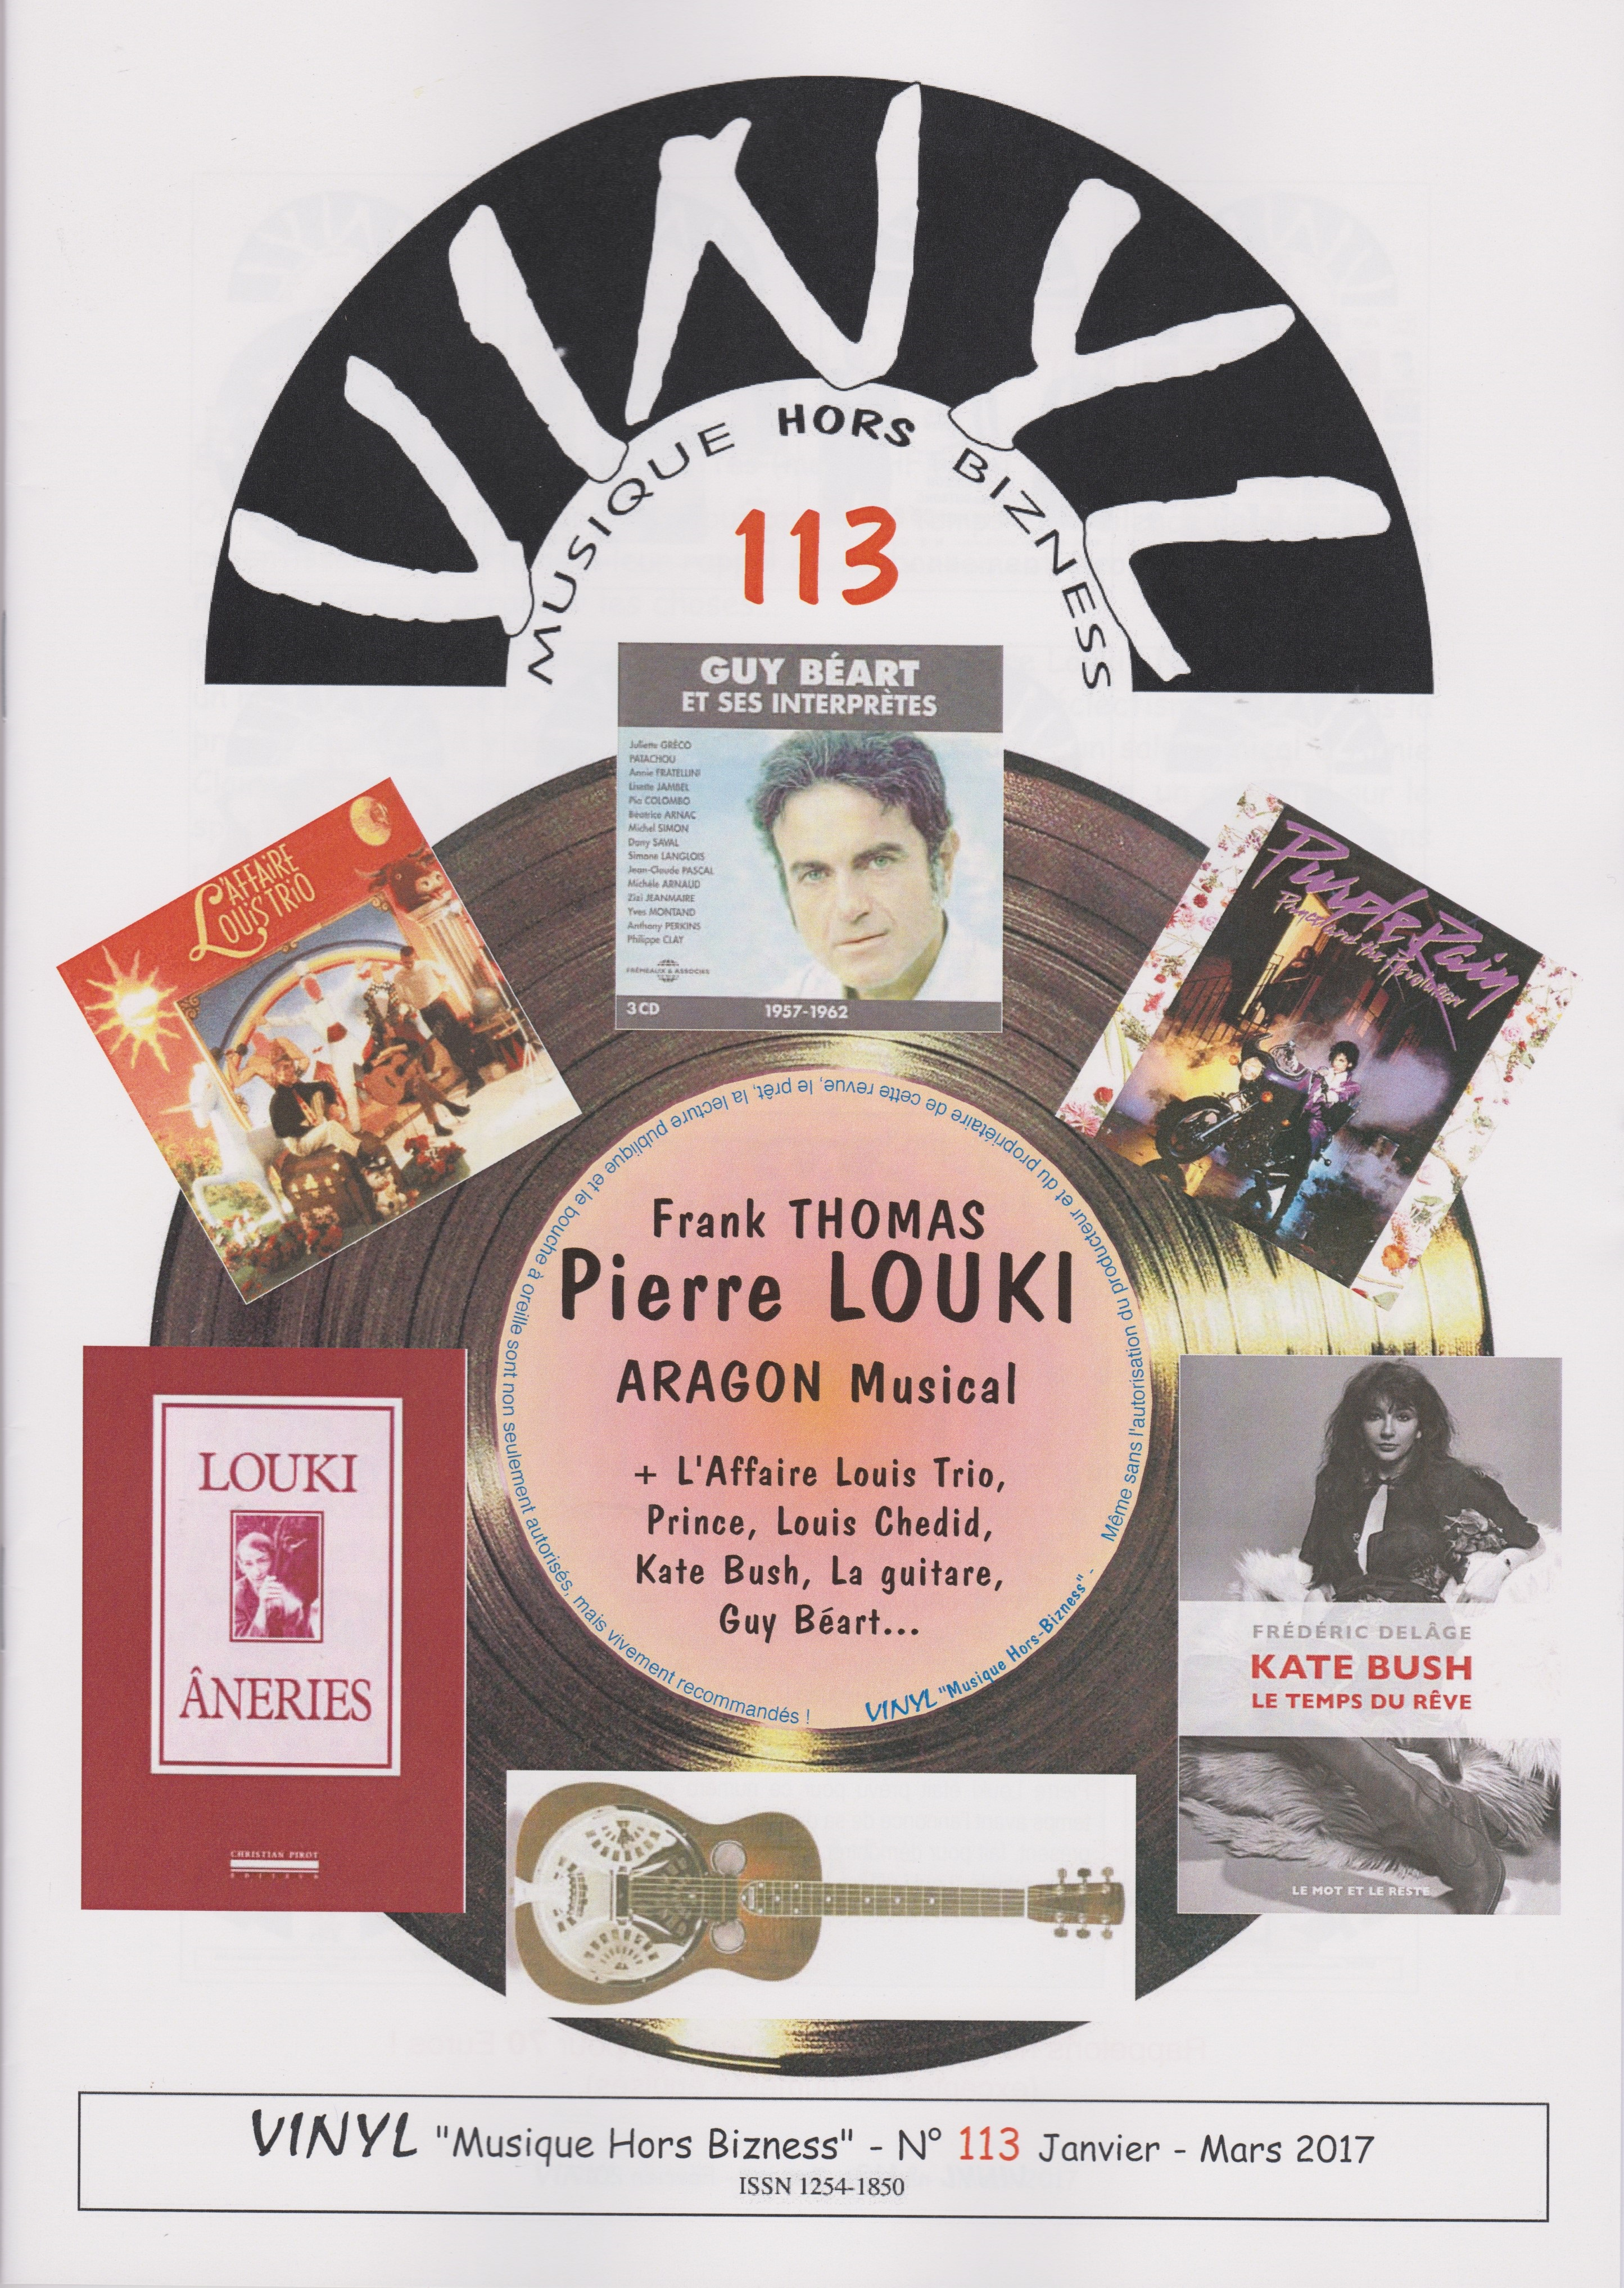 Vinyl 113